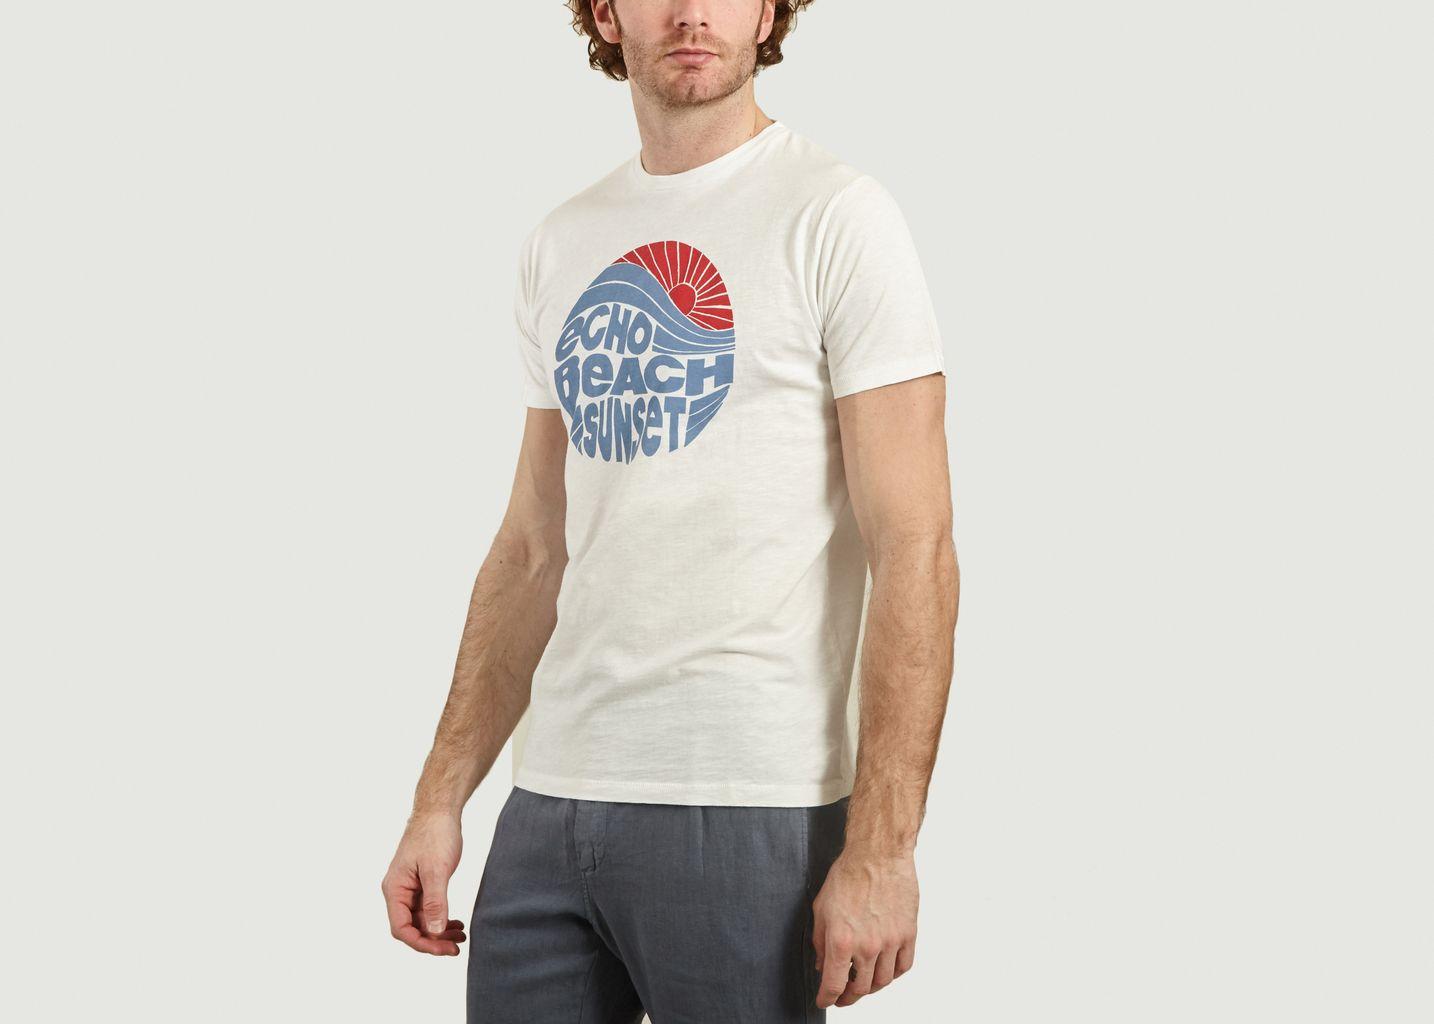 T-Shirt En Coton Imprimé Echo Beach Sunset - Hartford